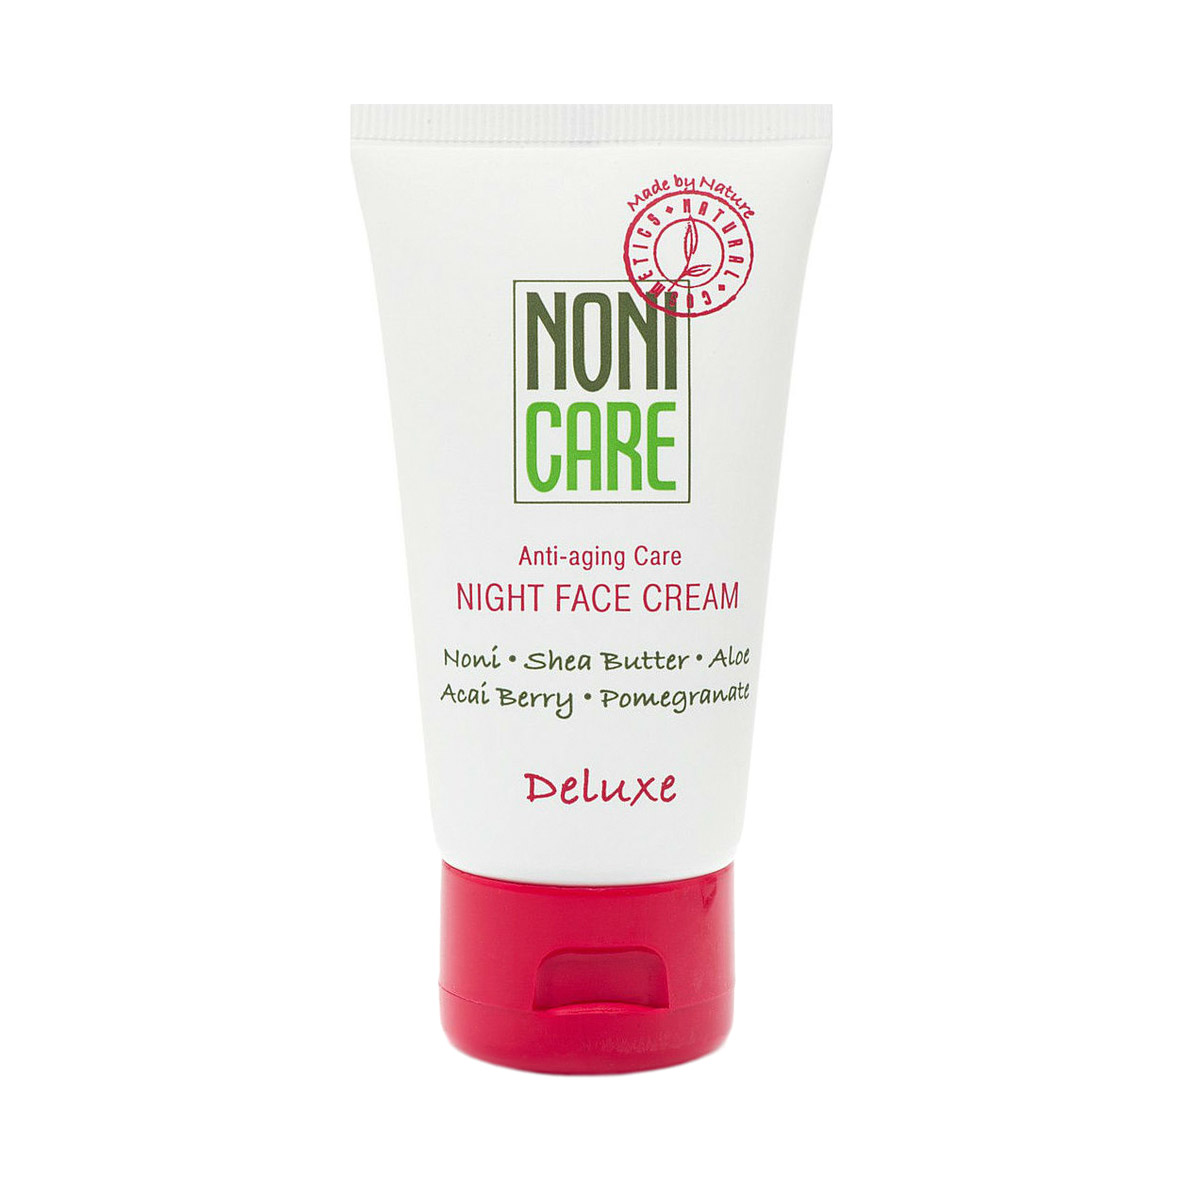 Ночной крем от морщин Nonicare Deluxe - Night Face Cream 50 мл 40+ ночной крем от морщин nonicare deluxe night face cream 50 мл 40